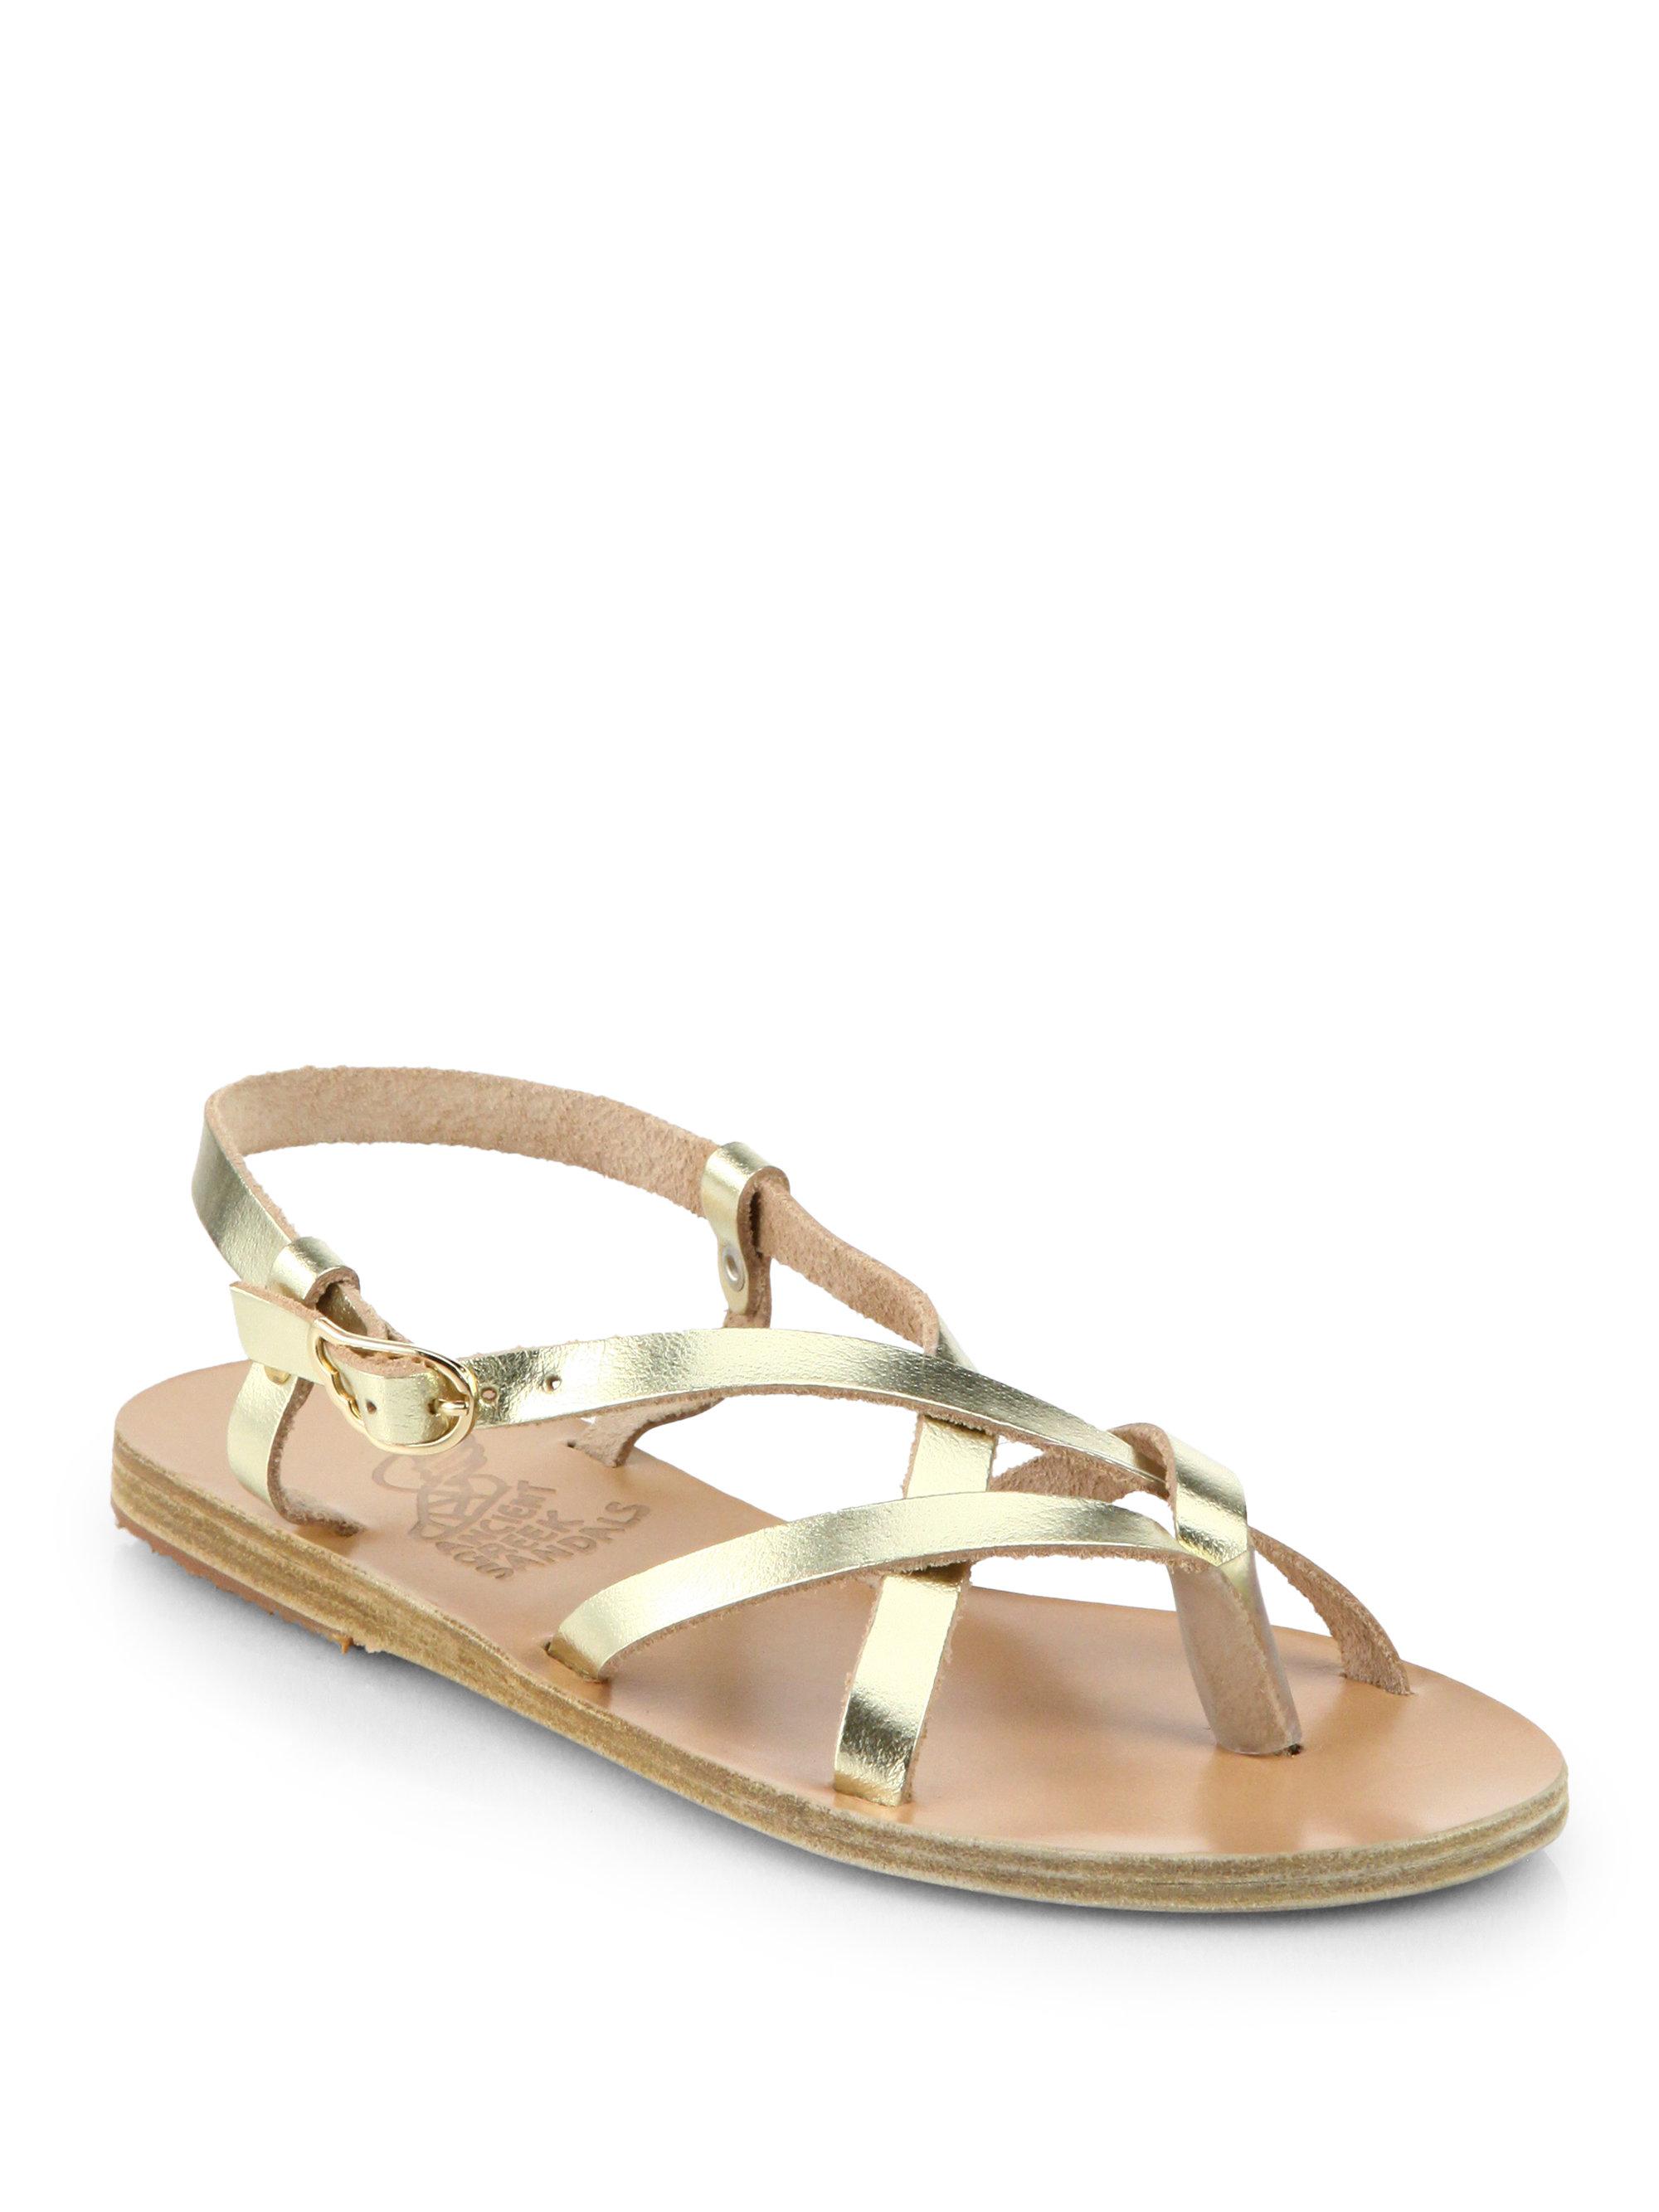 Ancient Greek Sandals Semele Criss Cross Leather Sandals